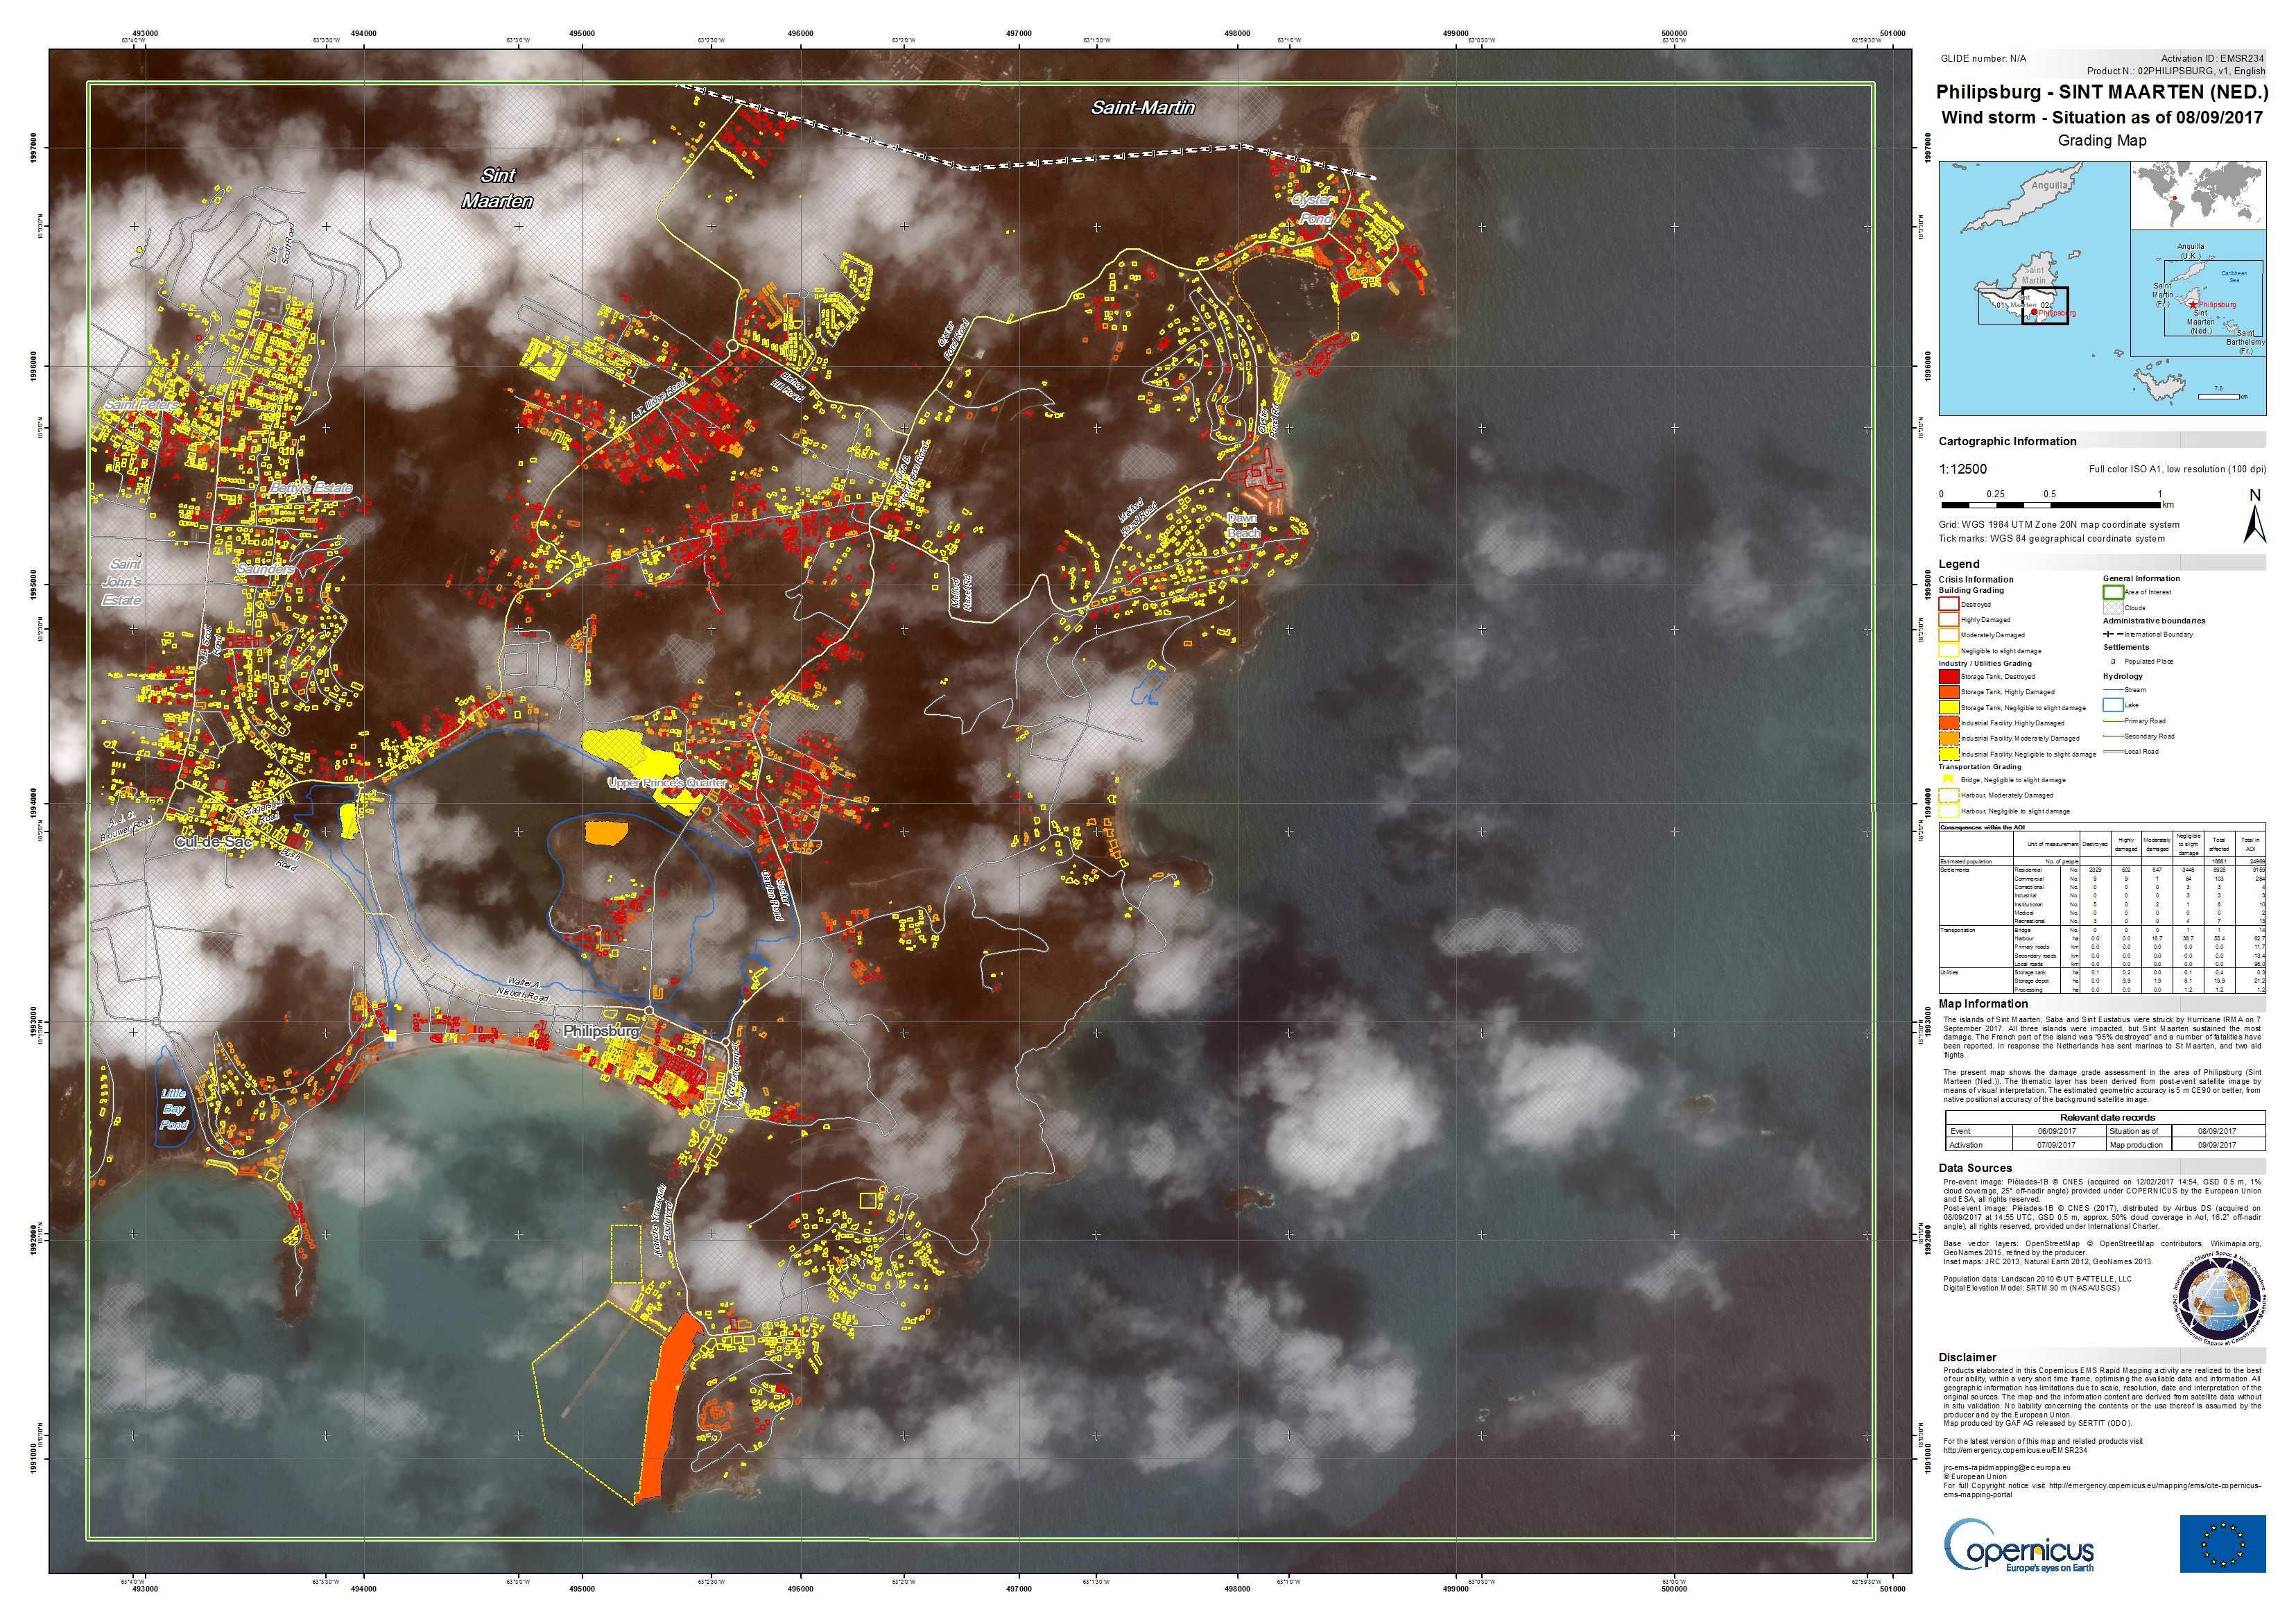 [EMSR234] Philipsburg, Sint Maarten (Ned.): Grading Map